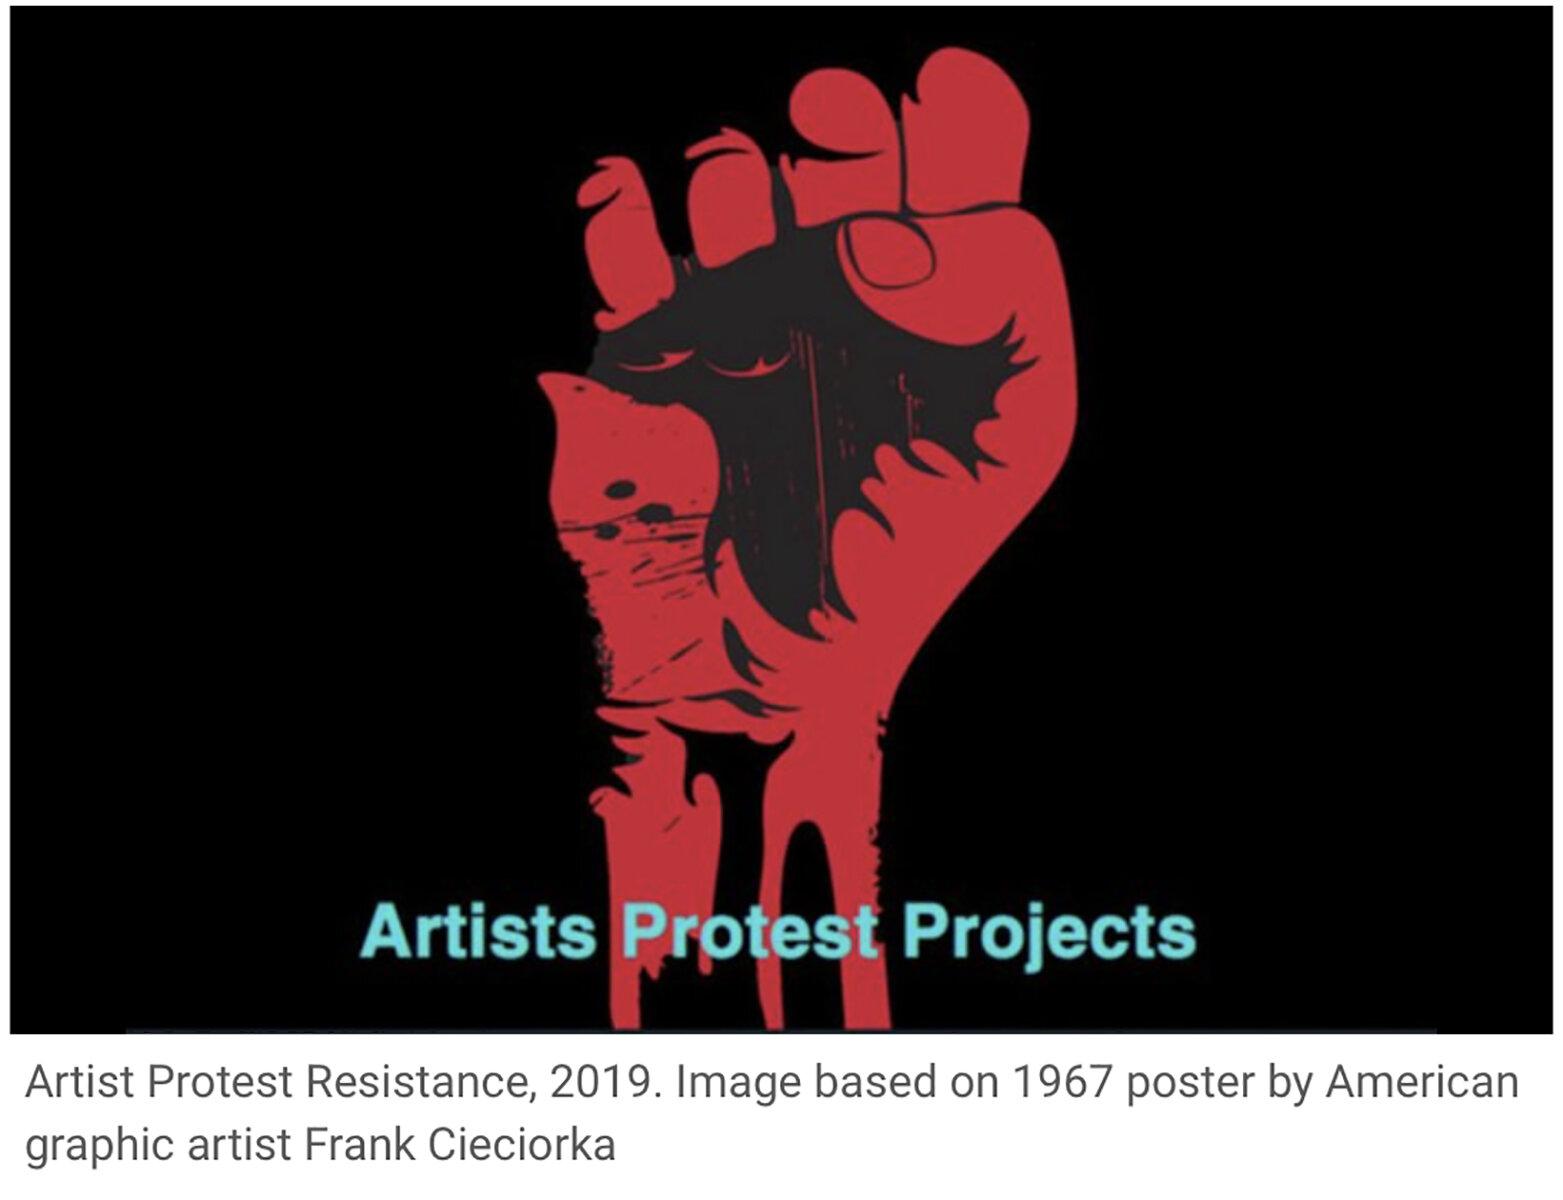 ArtistsProtestProject.jpg